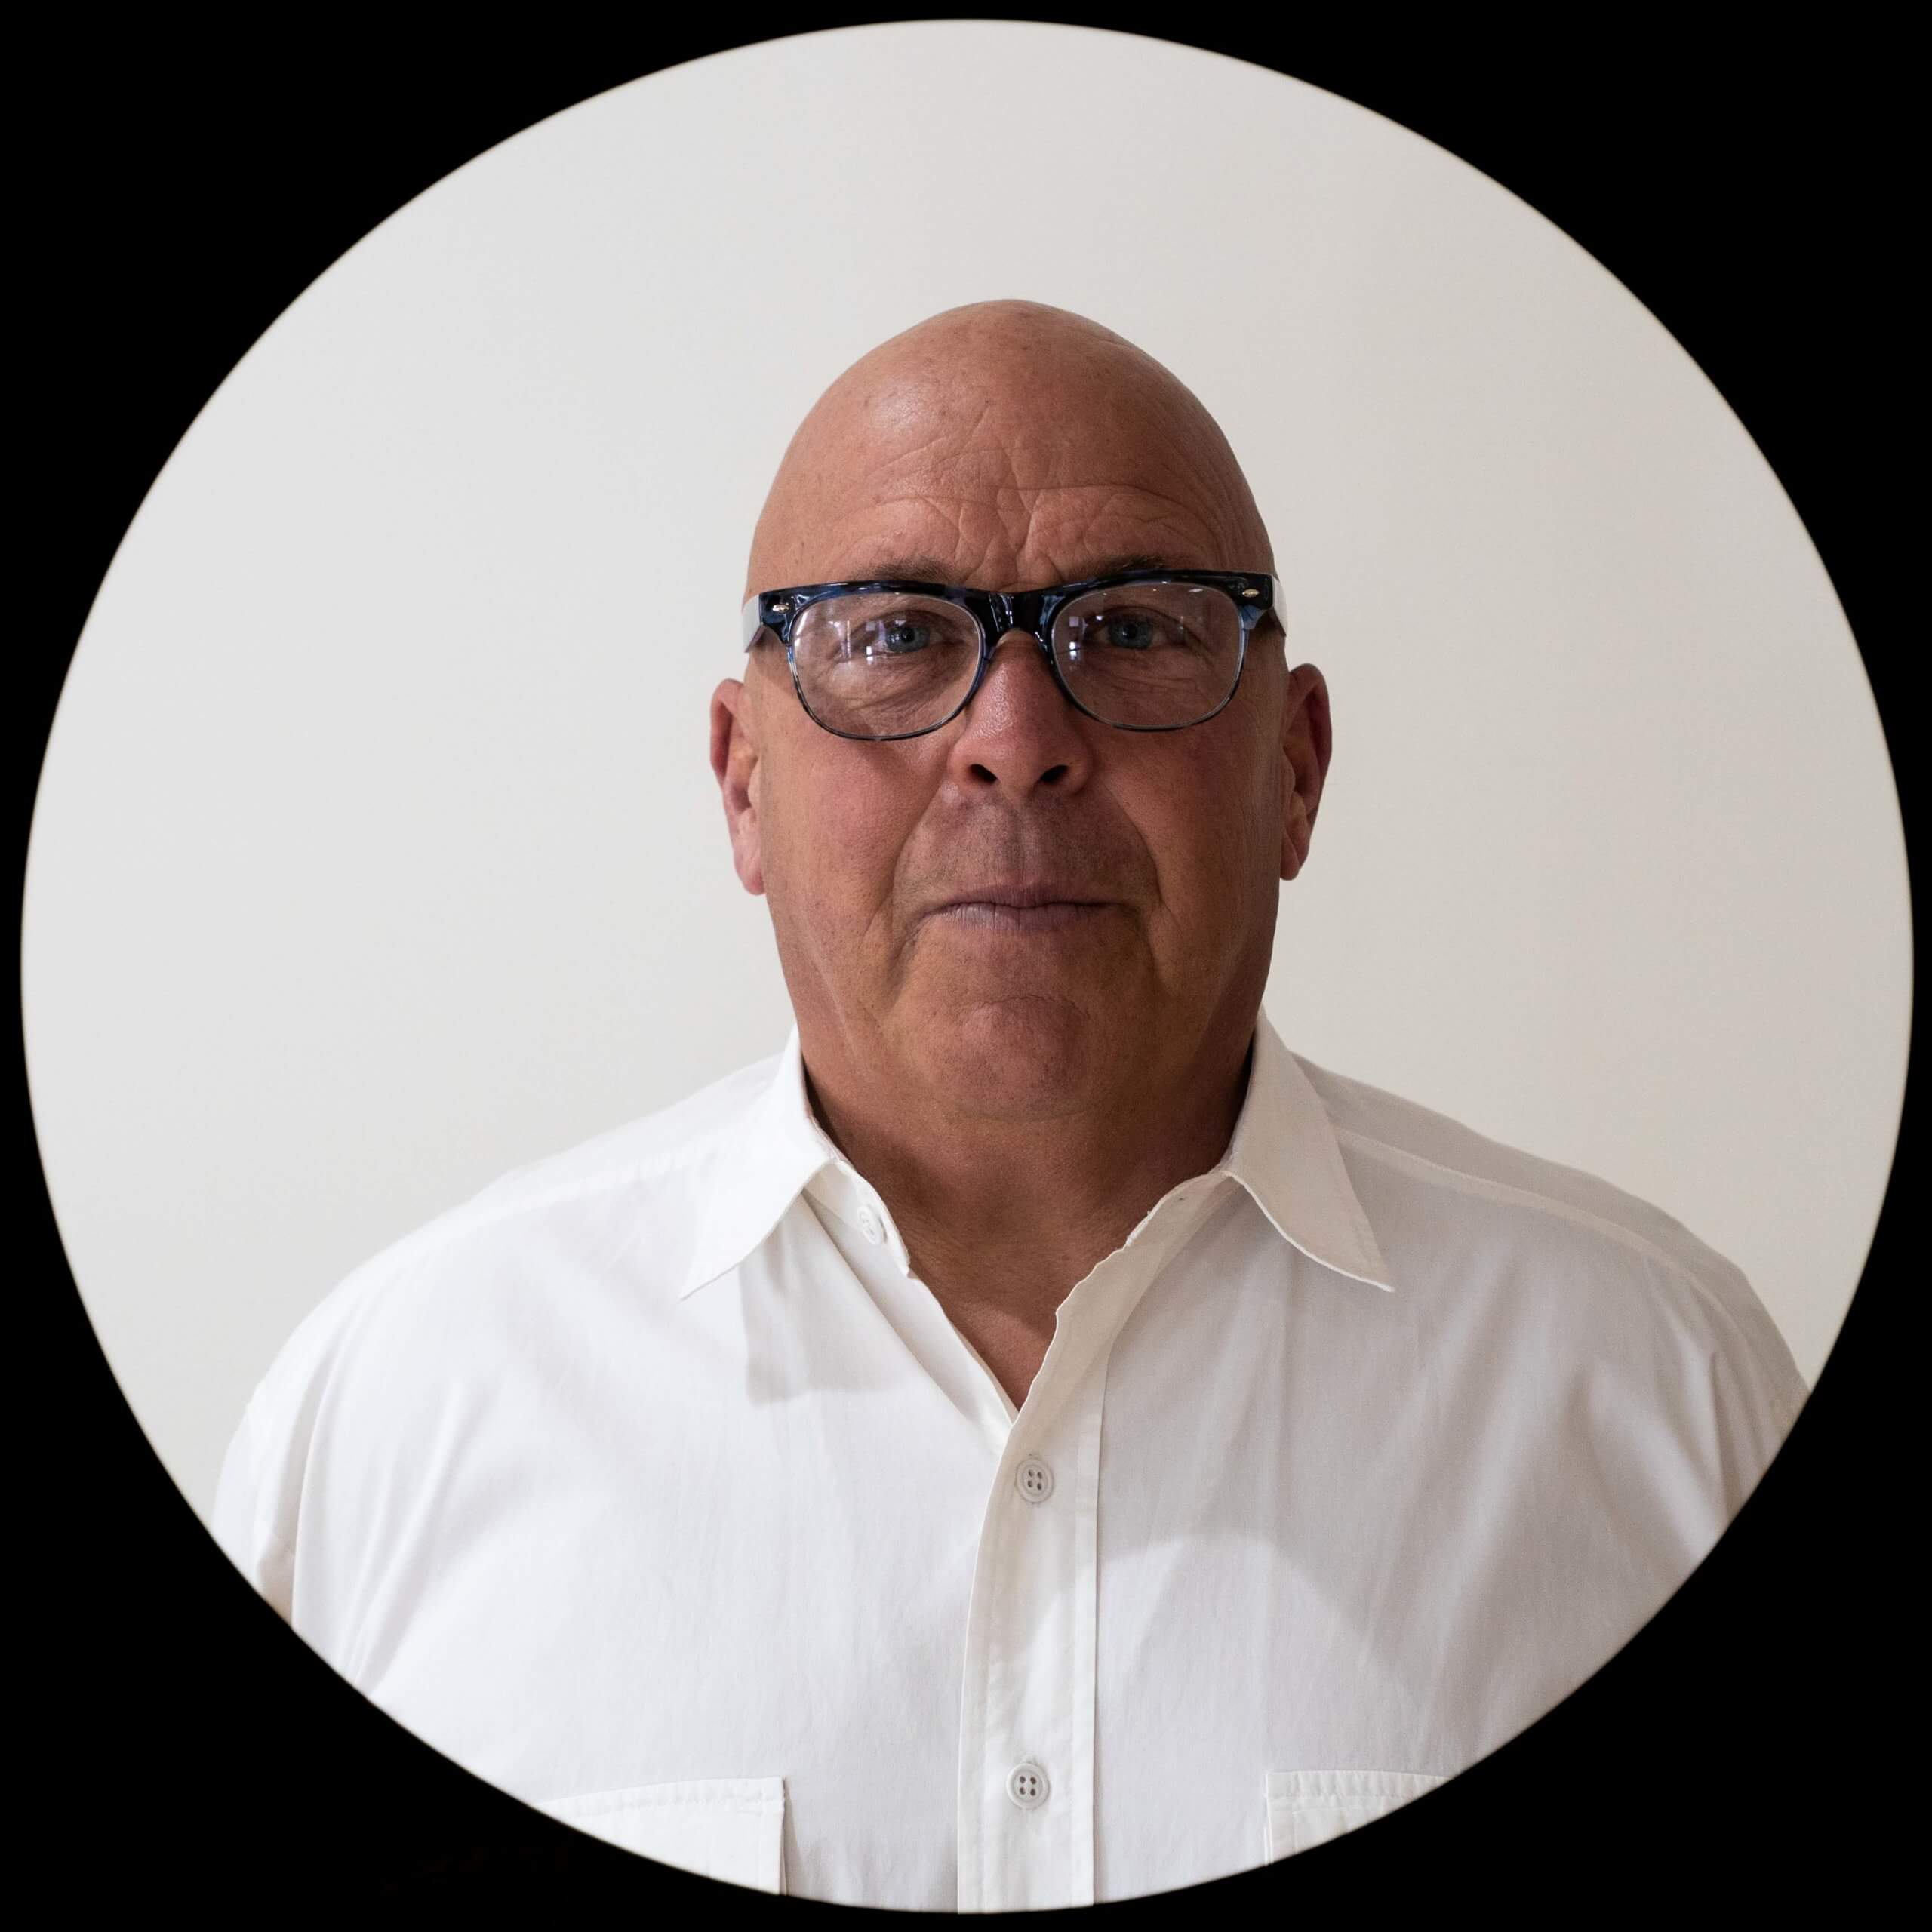 Frank Pazak